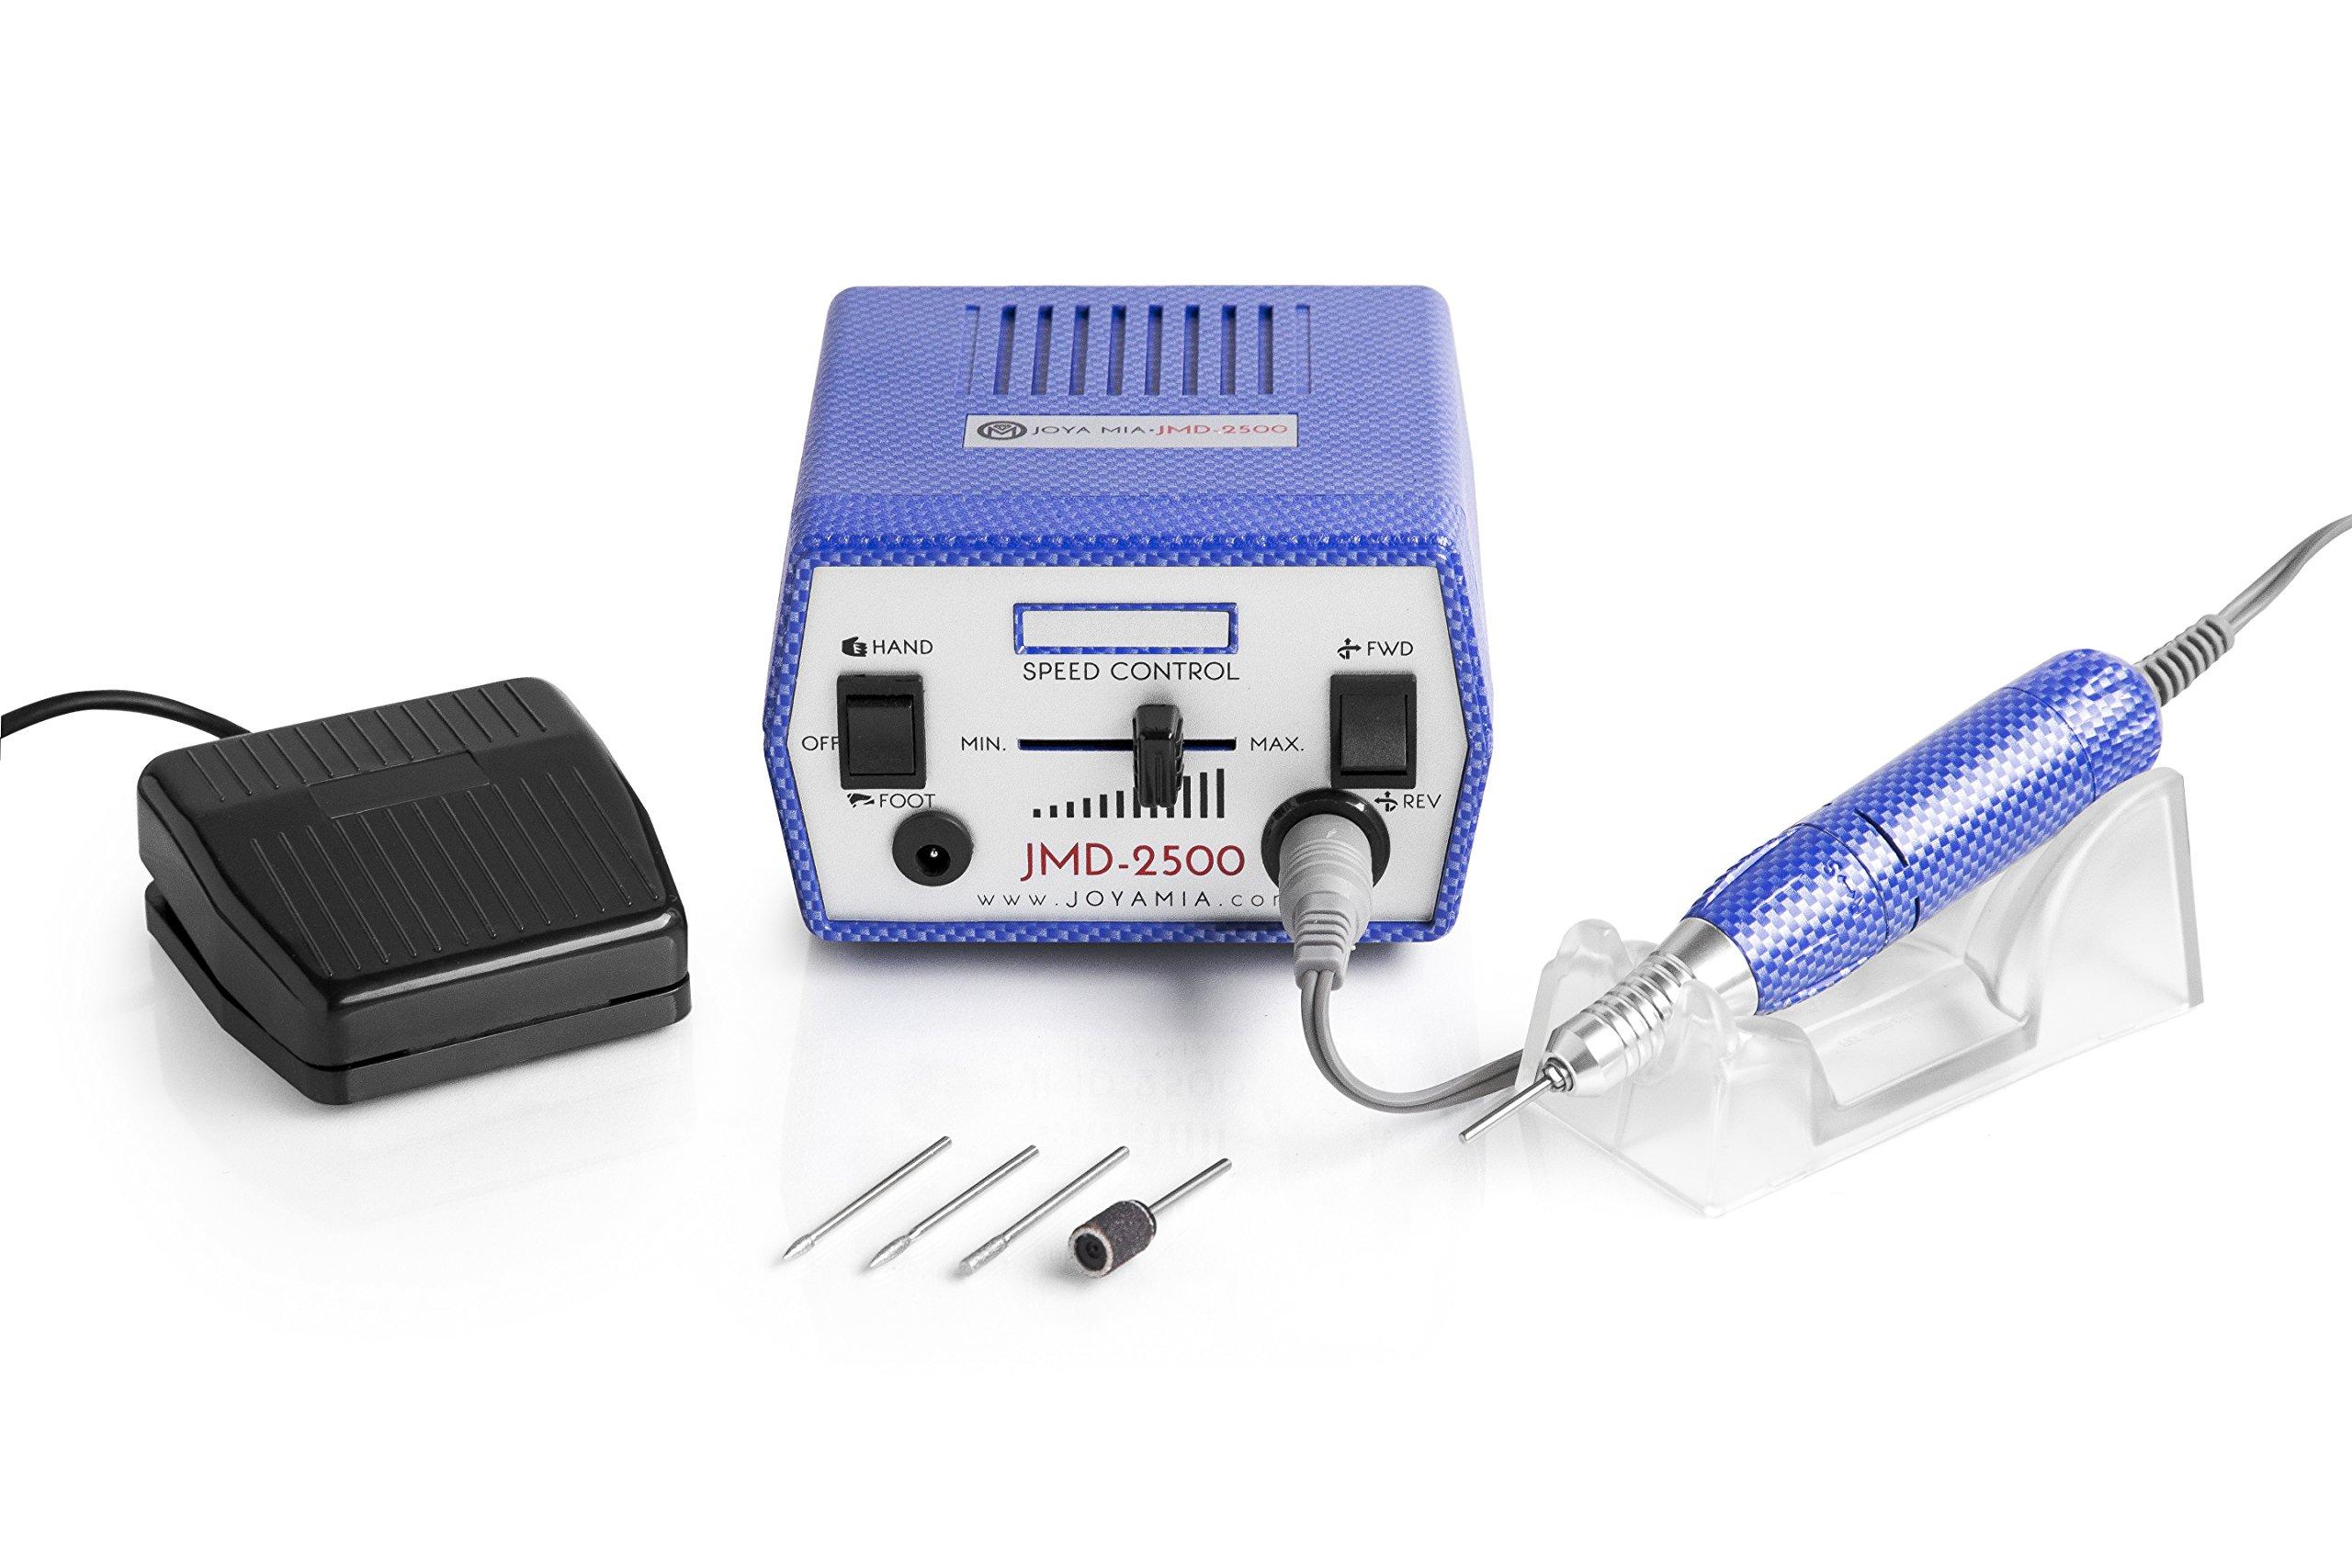 JOYA MIA JMD2500 Electric Nail Drill Manicure Pedicure Electric Nail E-File, 30,000 RPM, Blue